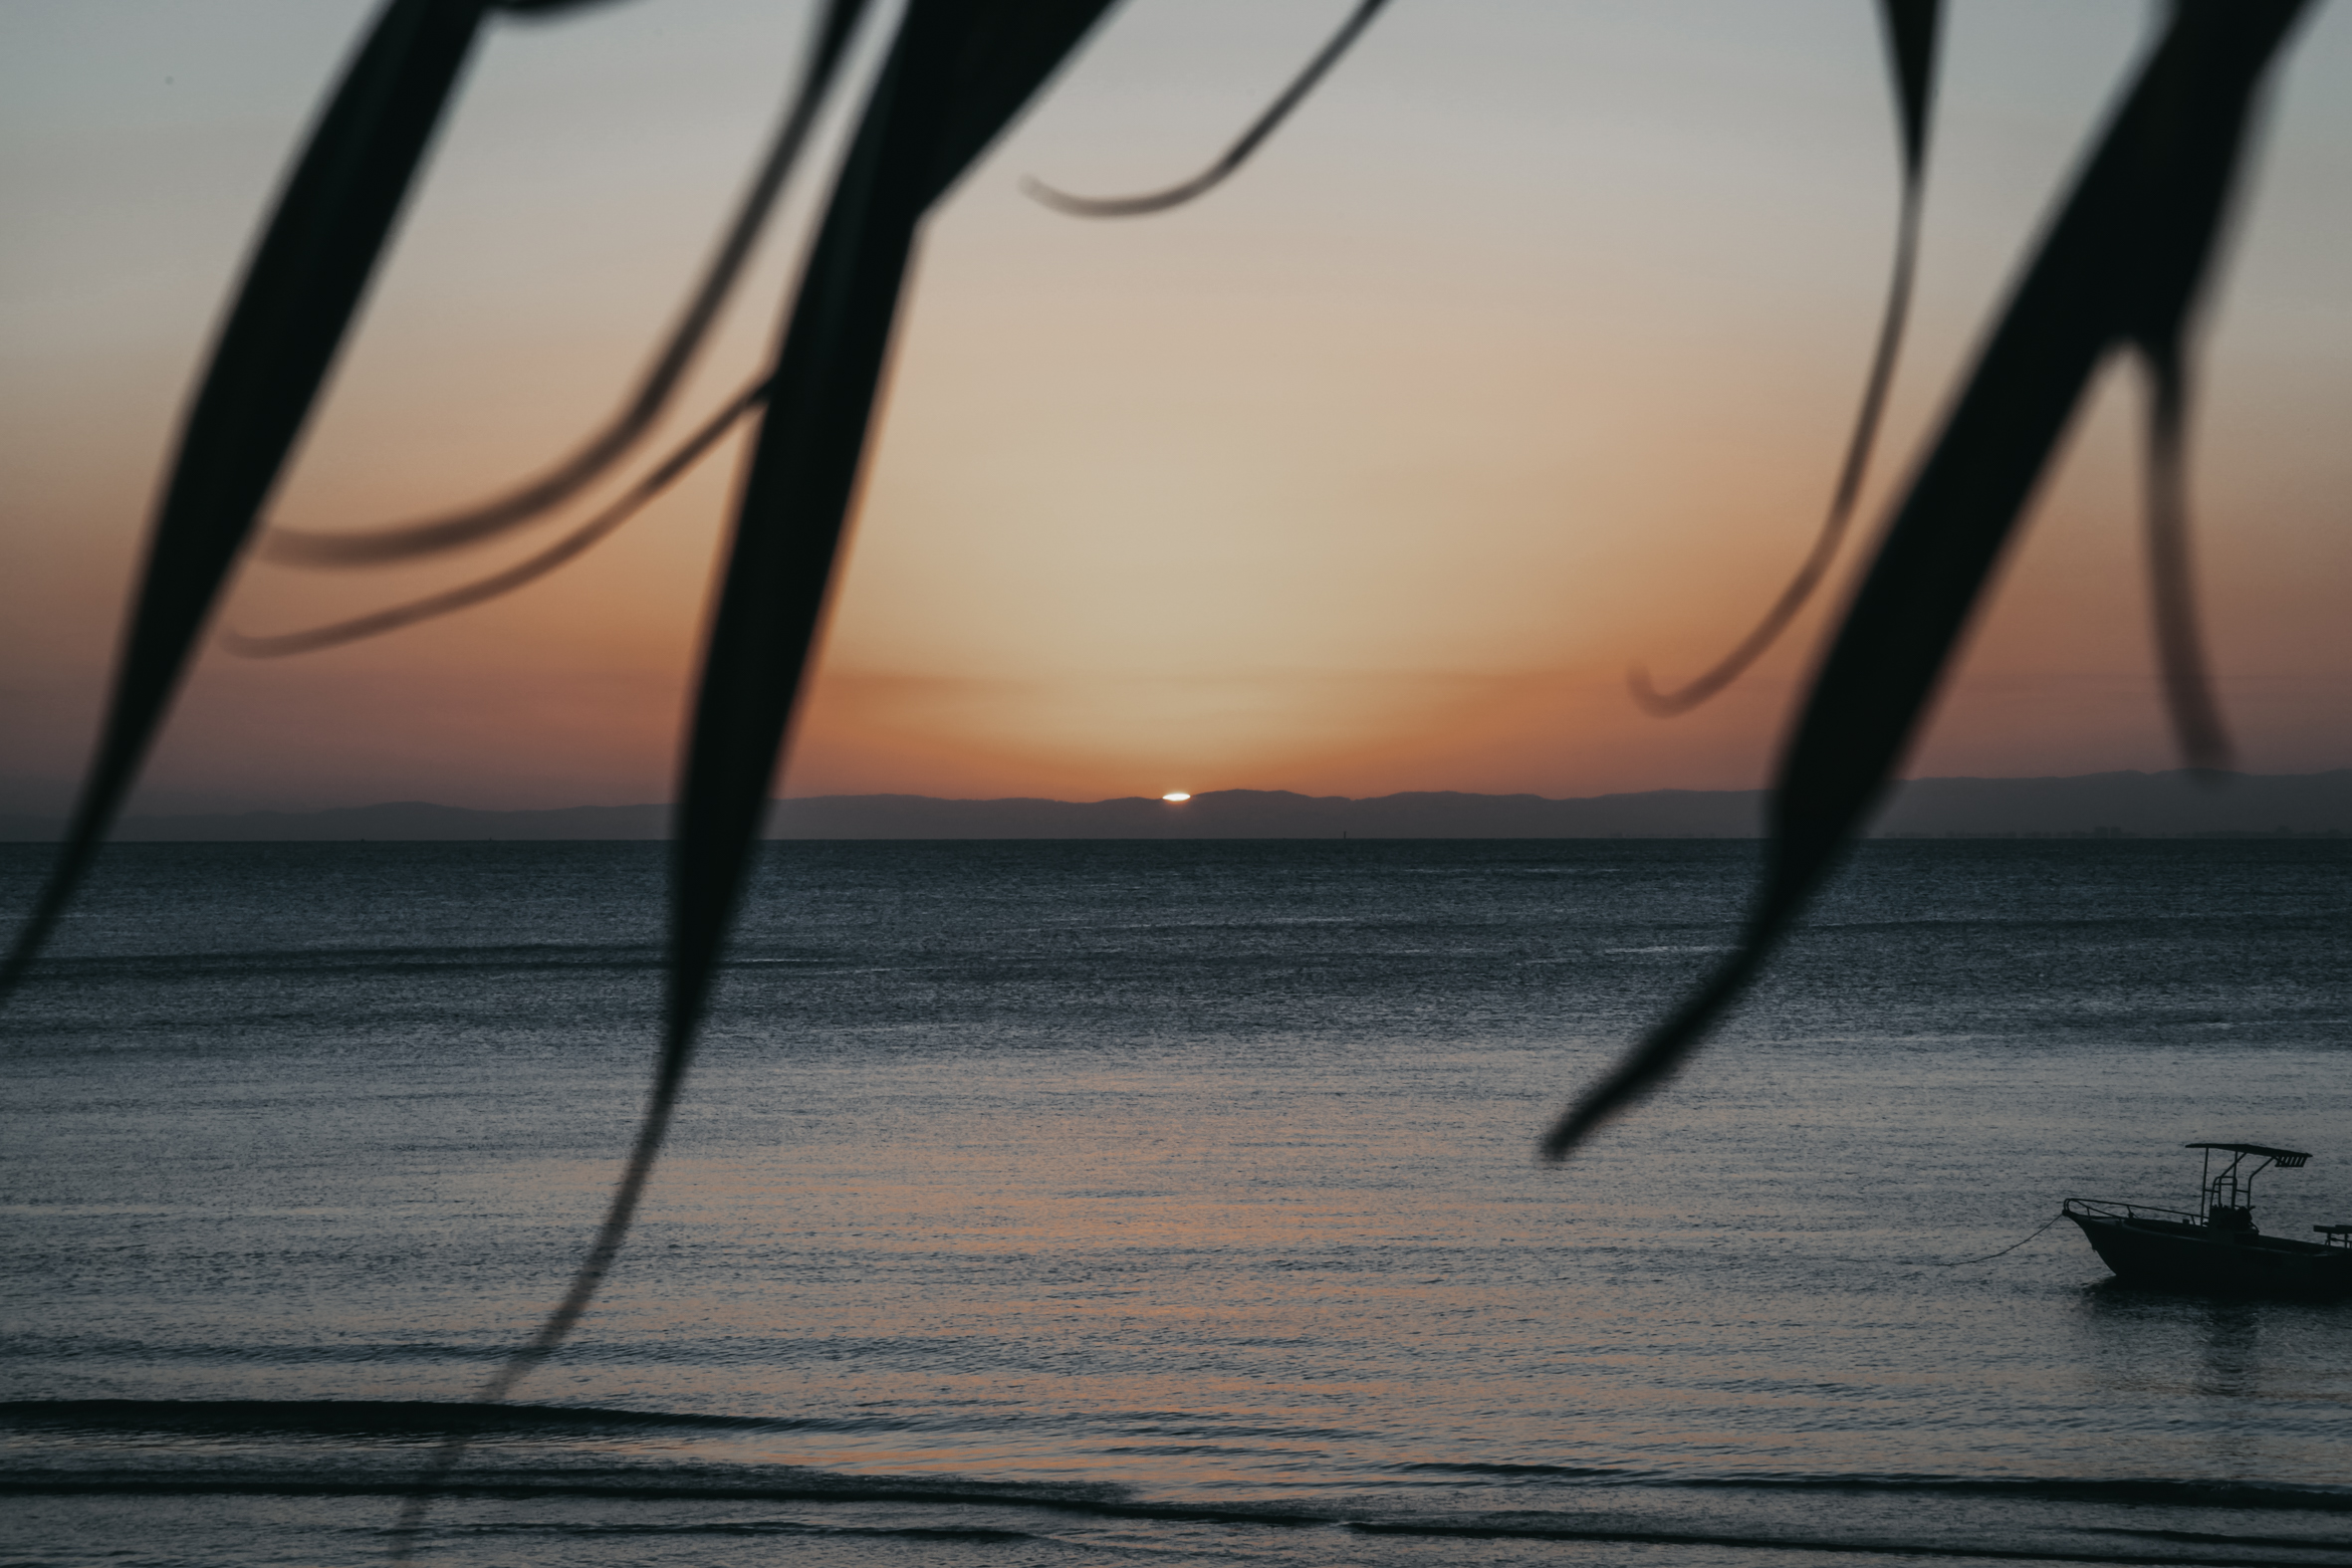 Moreton Bay | East Australia